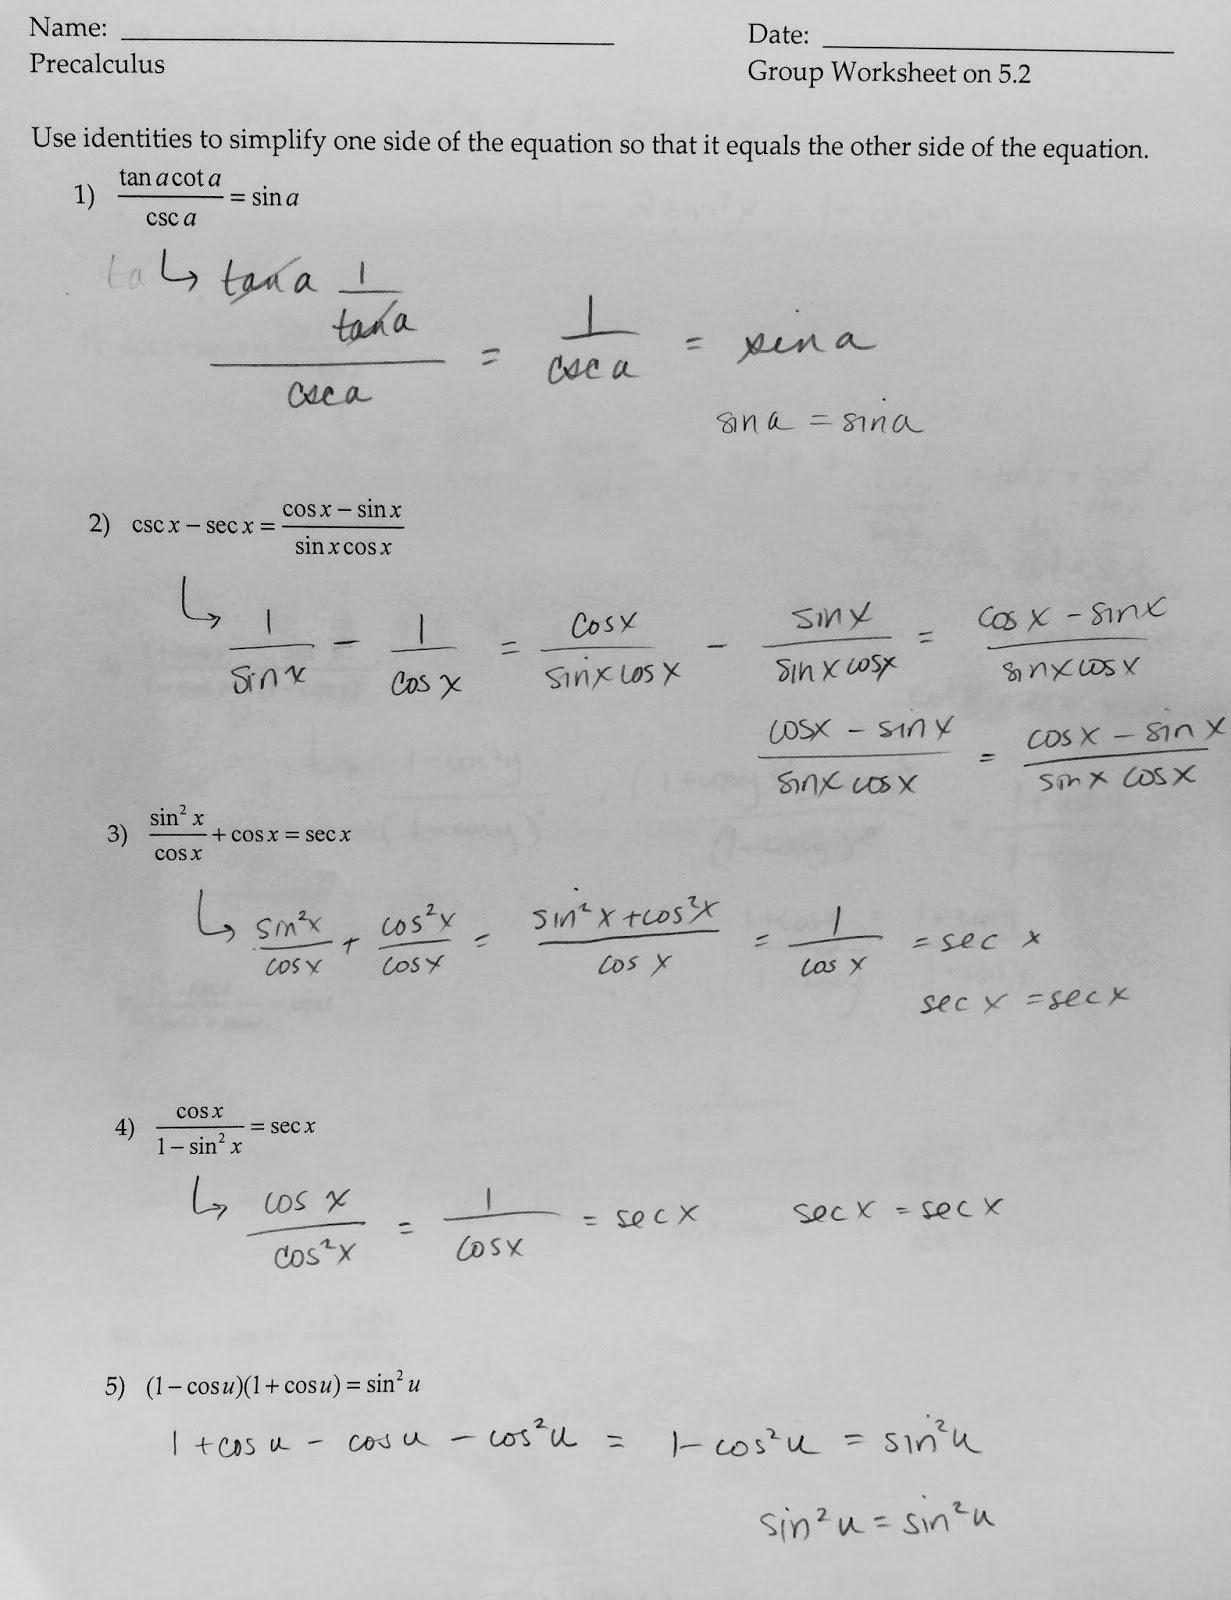 Solving Trigonometric Equations Worksheet Answers Luxury Precalculus 441 solving Trigonometric Equations Worksheets